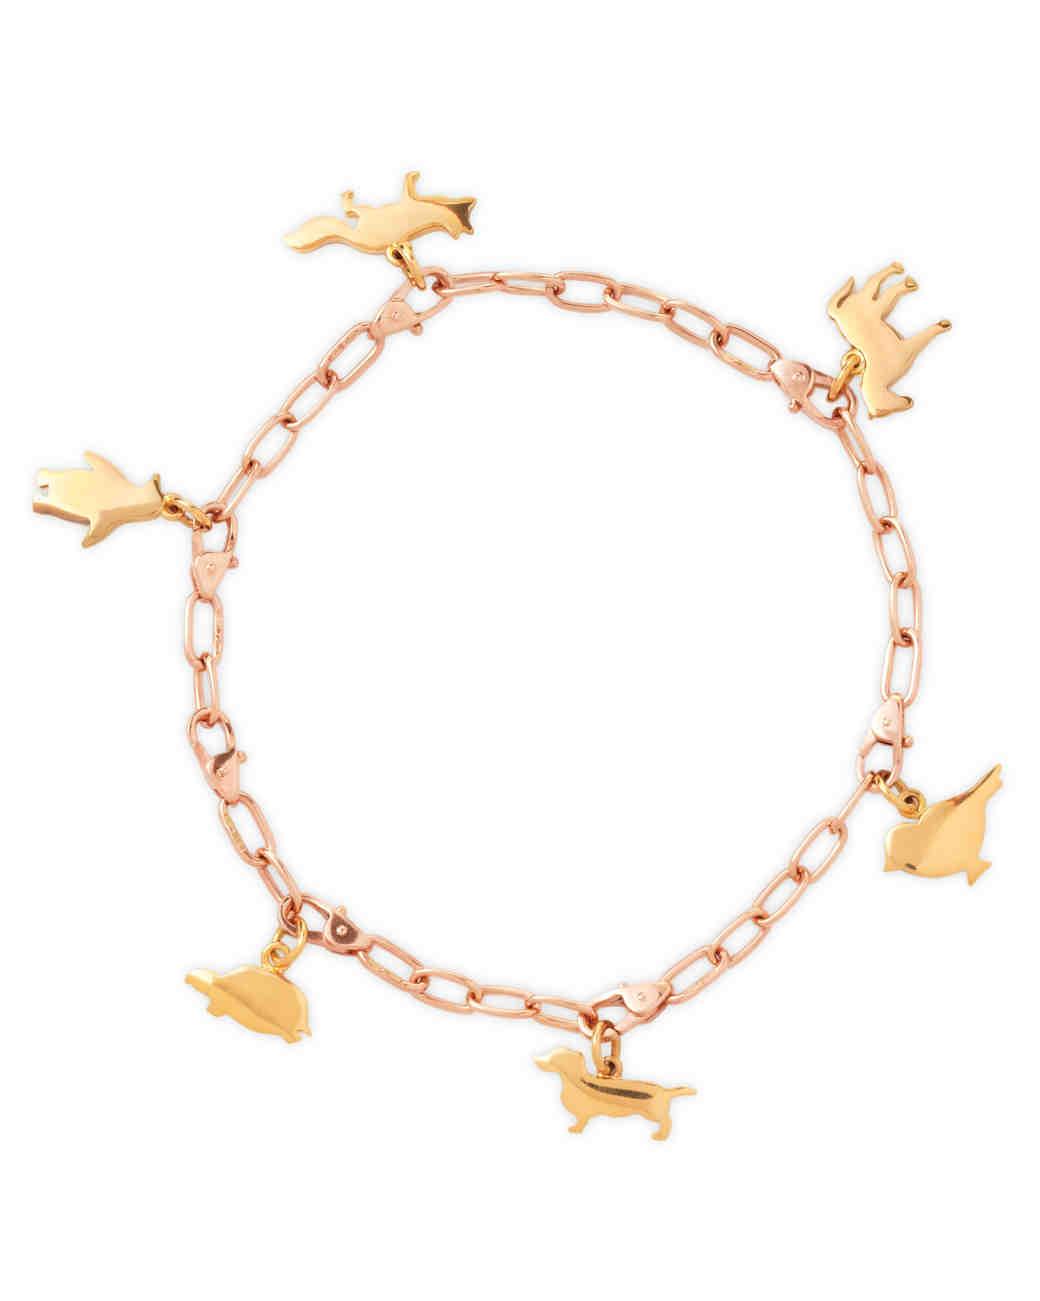 charm-bracelet-016-mwd110052.jpg